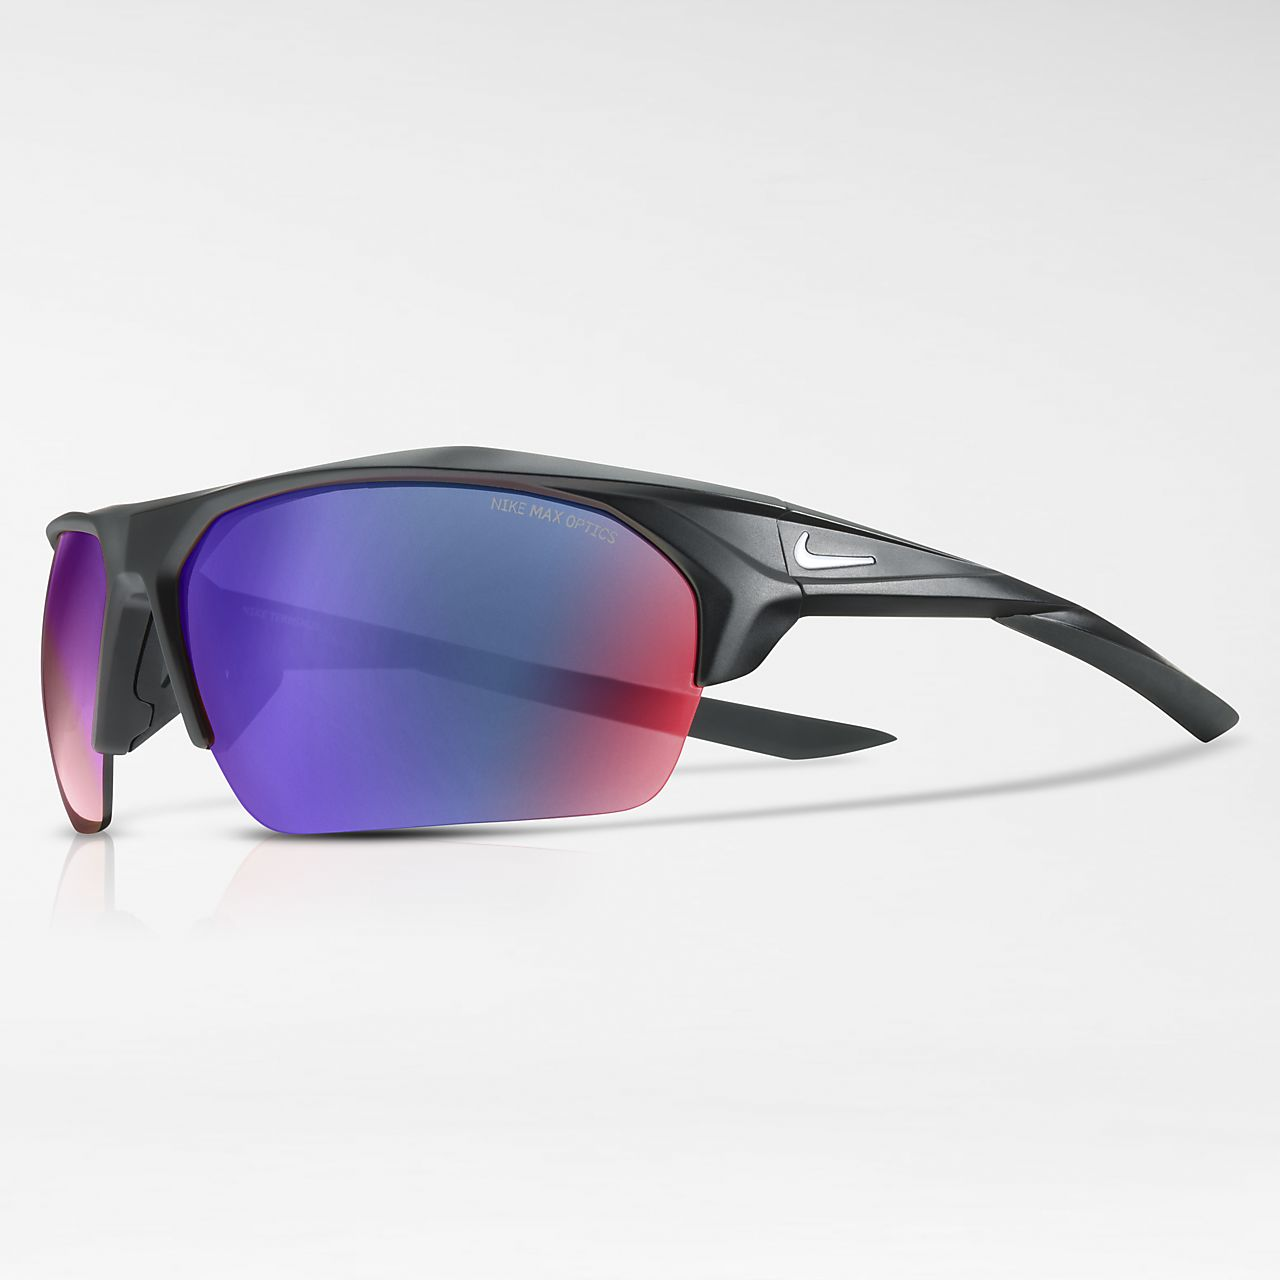 Low Resolution Nike Terminus Mirrored Sunglasses Nike Terminus Mirrored  Sunglasses